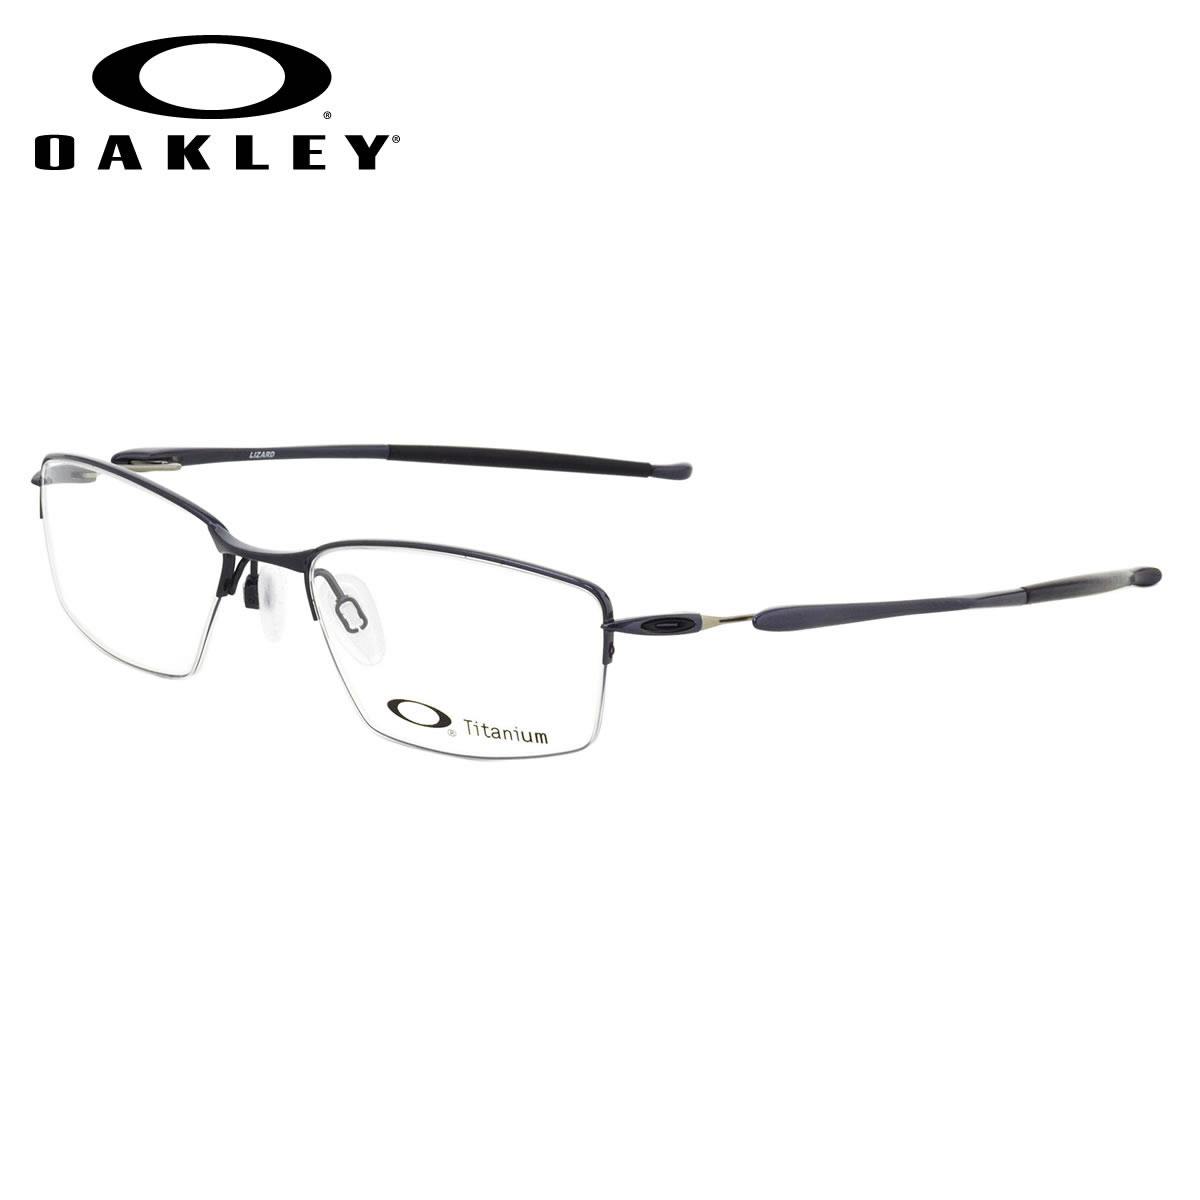 165910974e (OAKLEY) Glasses OX5113-0451 LIZARD Polished Midnight lizard square Ney  roll OAKLEY Date glasses lens for free men gap Dis